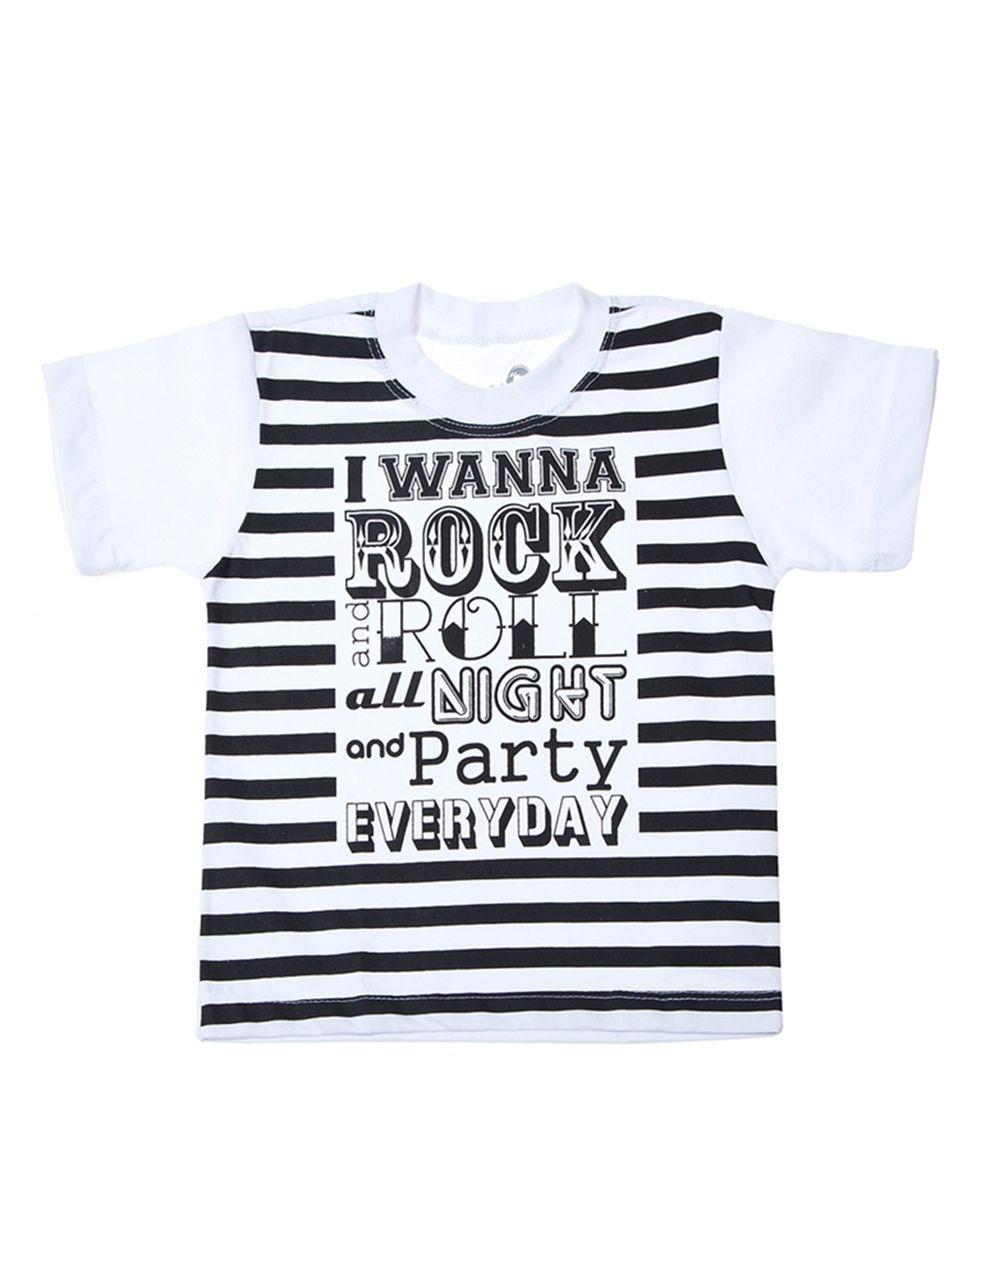 Camiseta Malha Algodão I wanna rock n roll all night and party every day!  http://www.minime.com.br/camiseta-malha-algodao-i-wanna-rock-1218.aspx/p